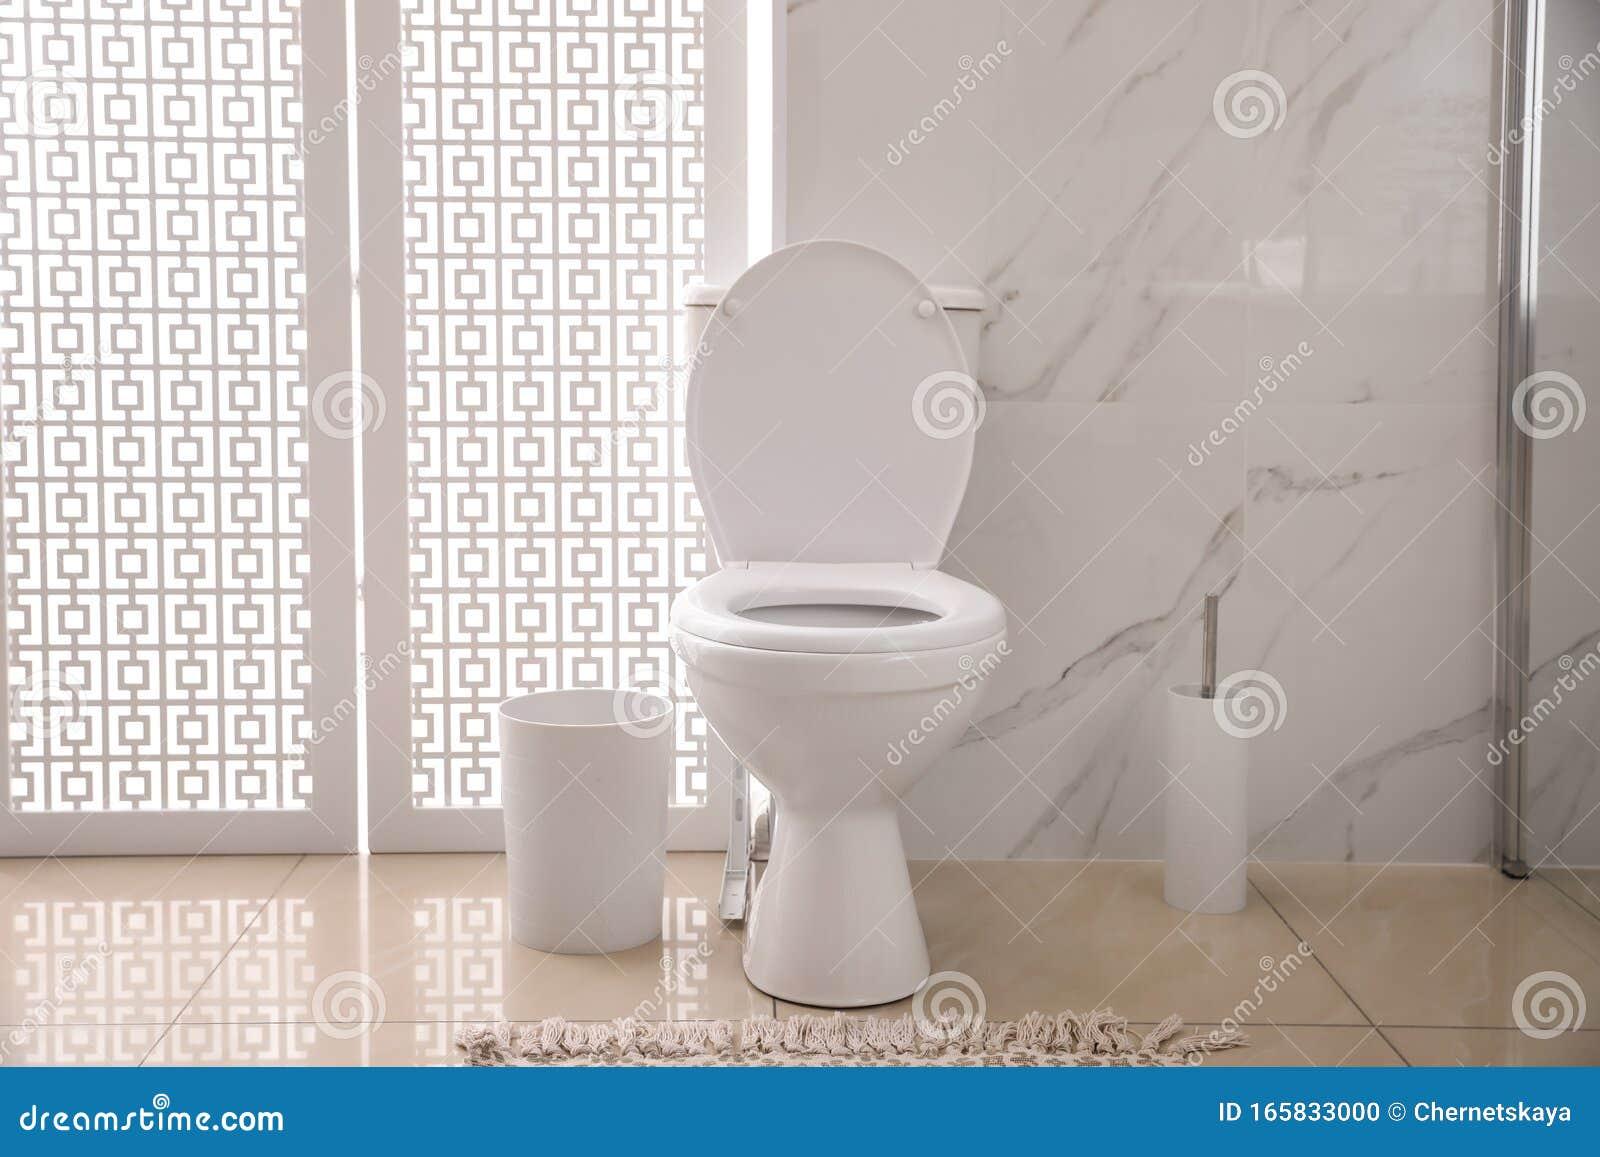 Modern White Toilet Bowl Near Marble Wall Stock Photo Image Of Interior Clean 165833000